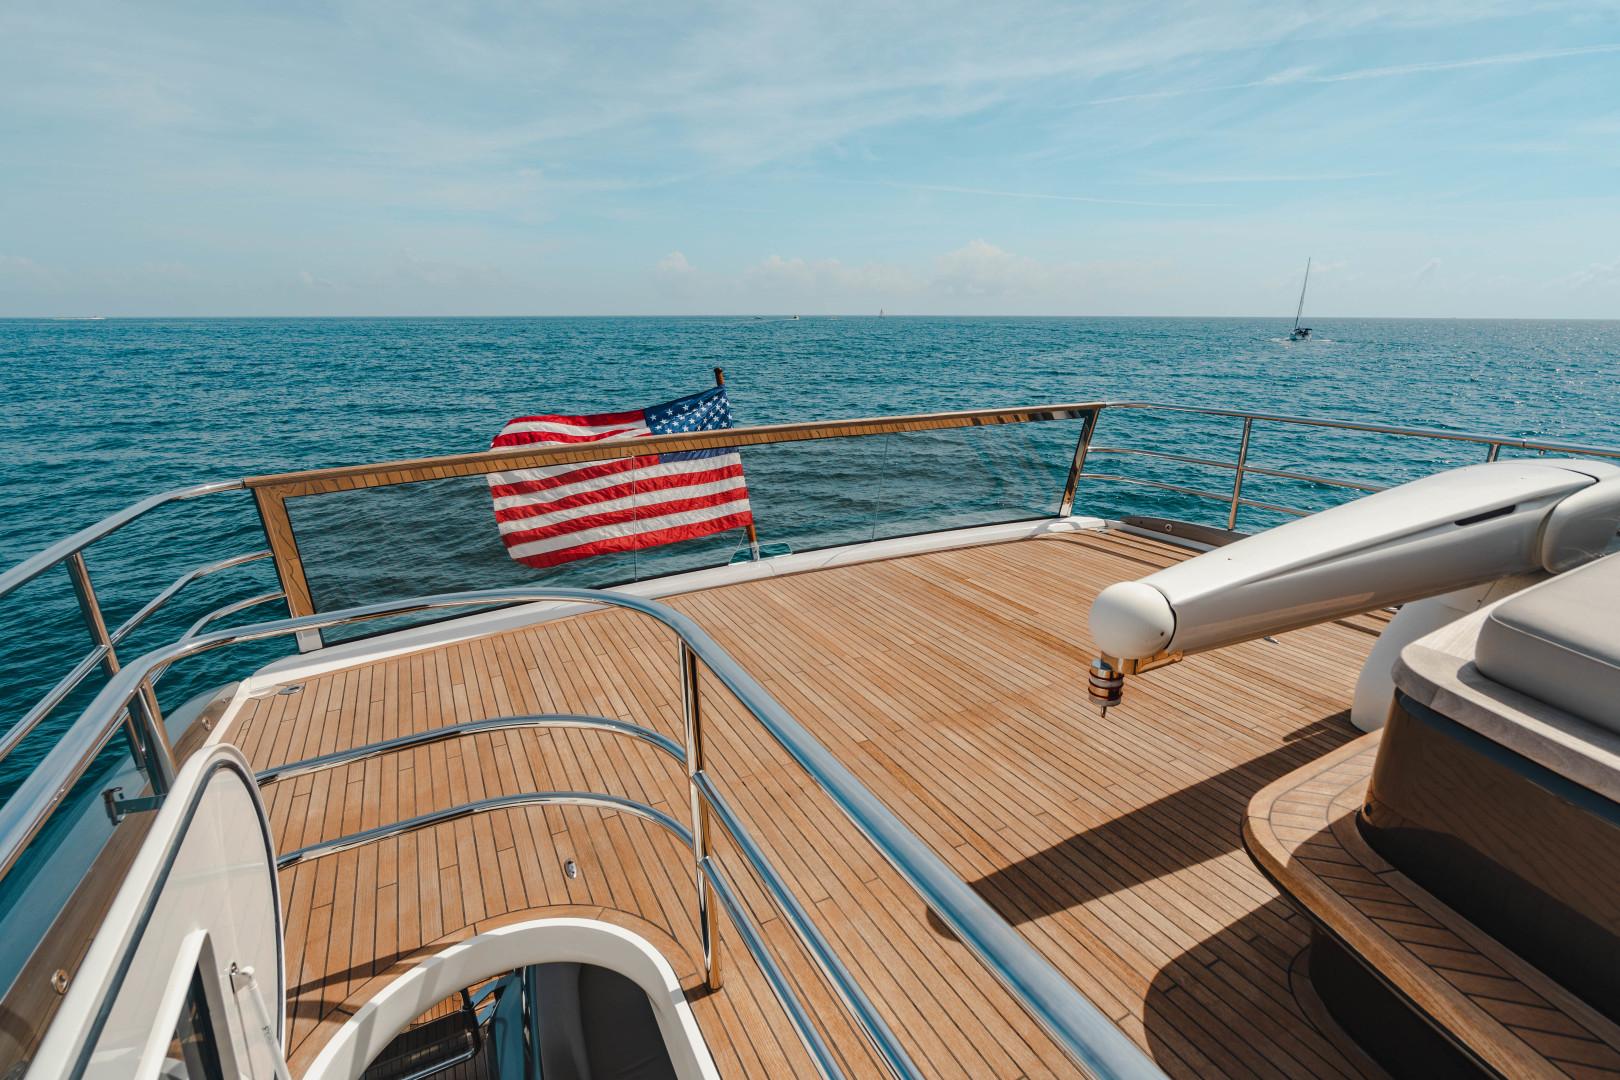 Princess-Y85  2019-Splash Delray Beach-Florida-United States-1631641 | Thumbnail